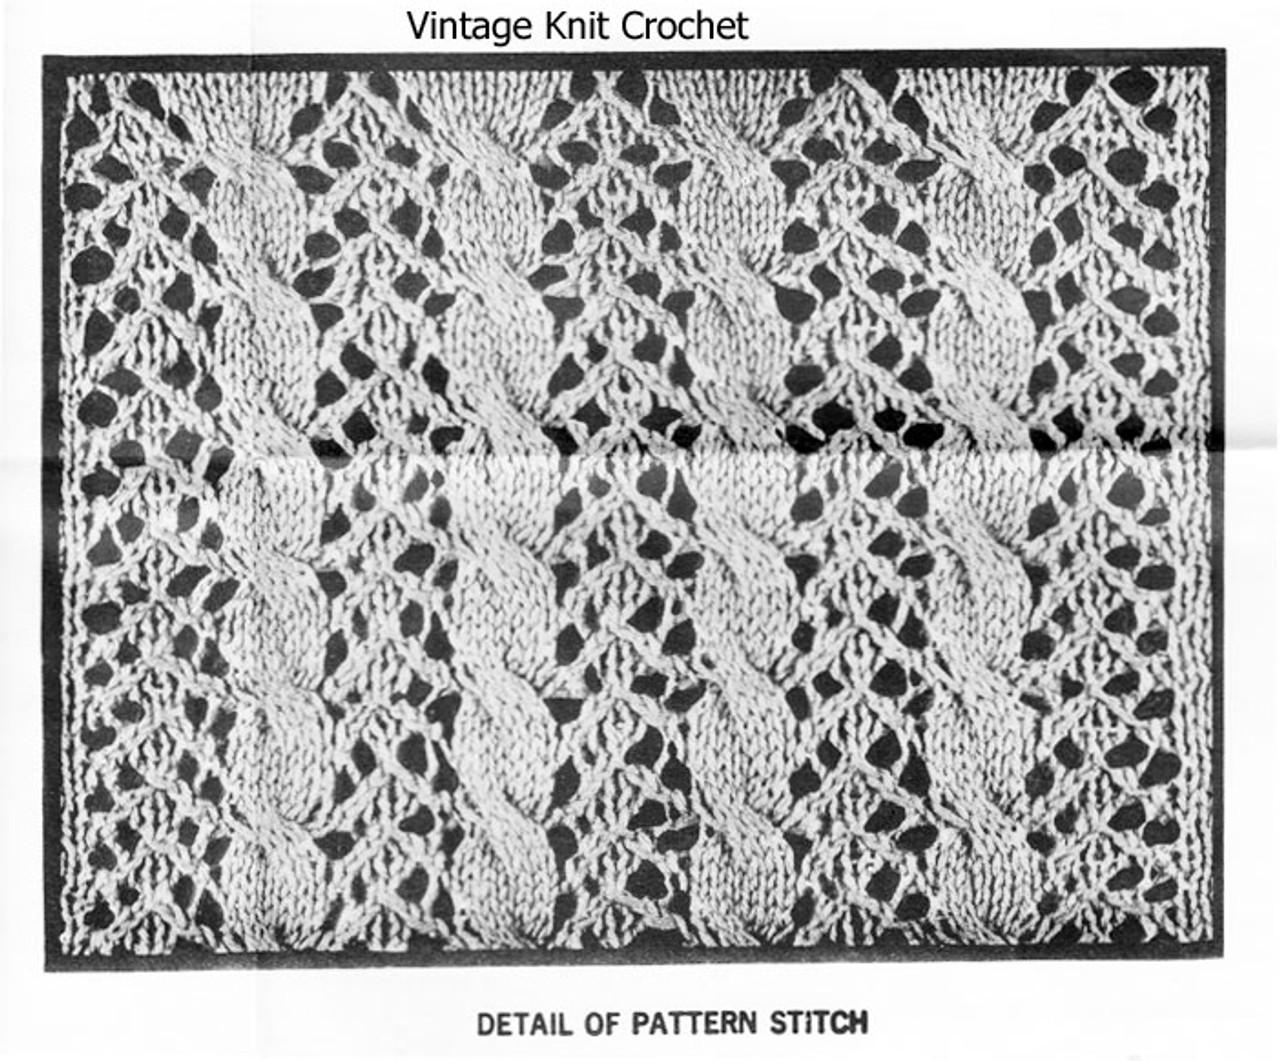 Cable Pattern Stitch Knitting Illustration